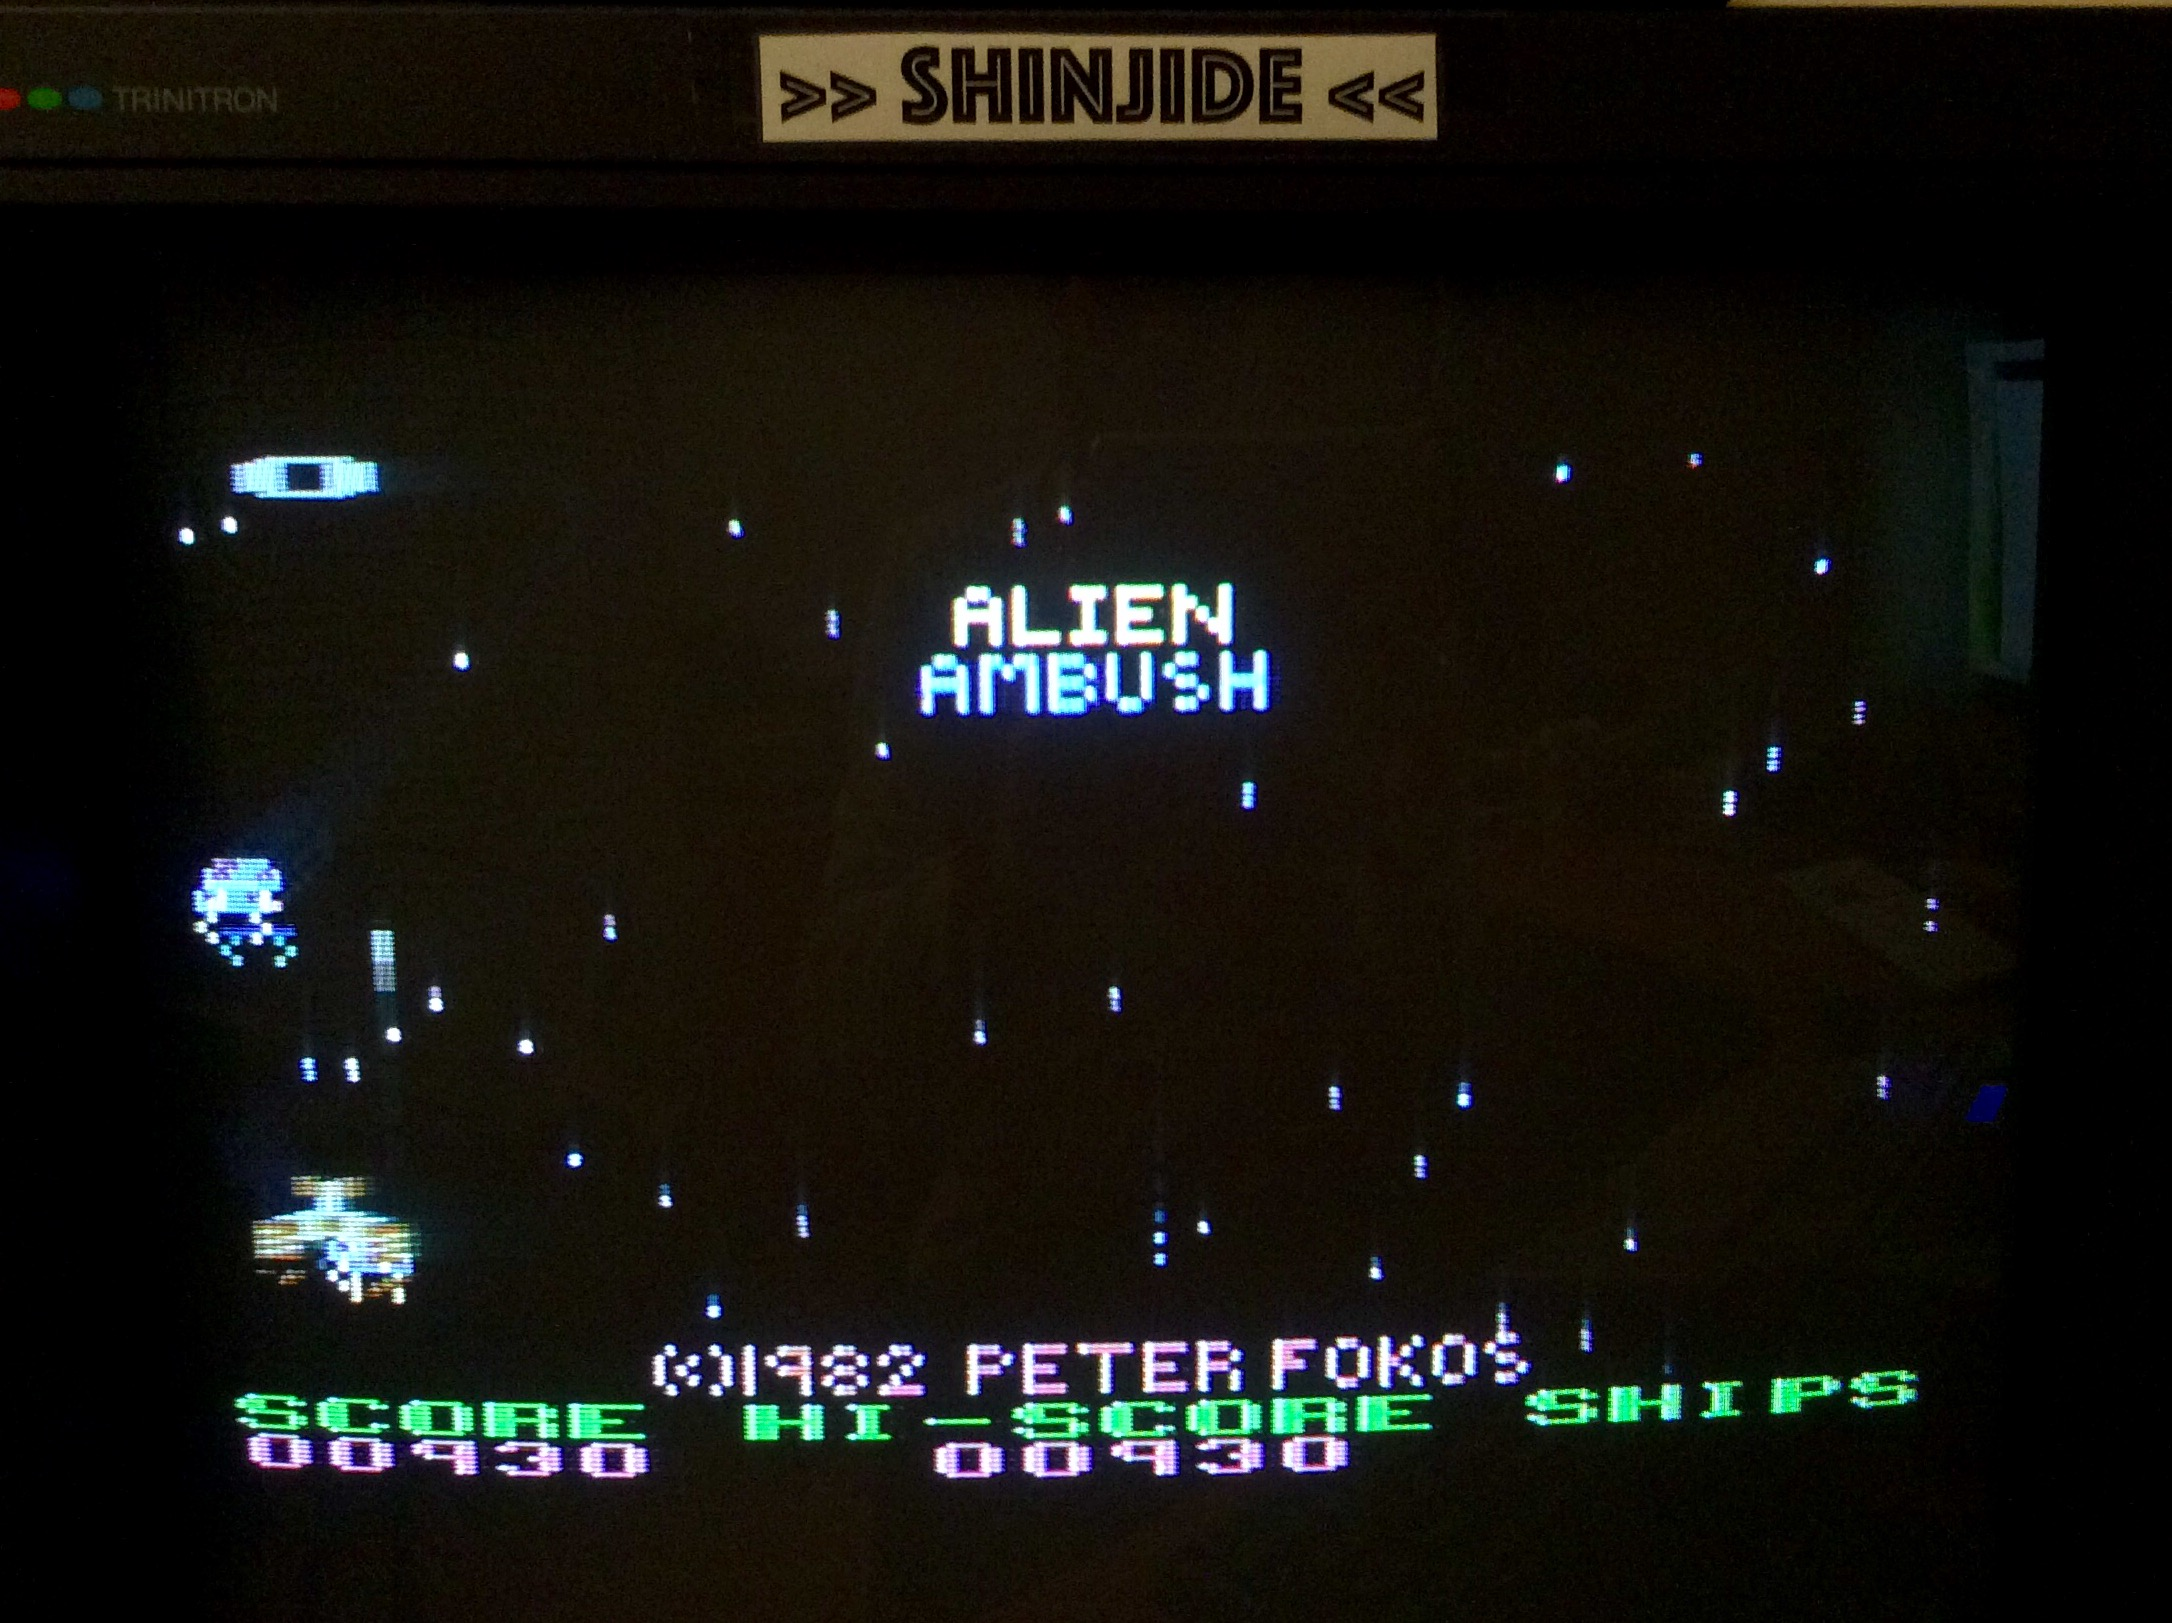 SHiNjide: Alien Ambush (Atari 400/800/XL/XE) 930 points on 2015-11-16 13:59:53